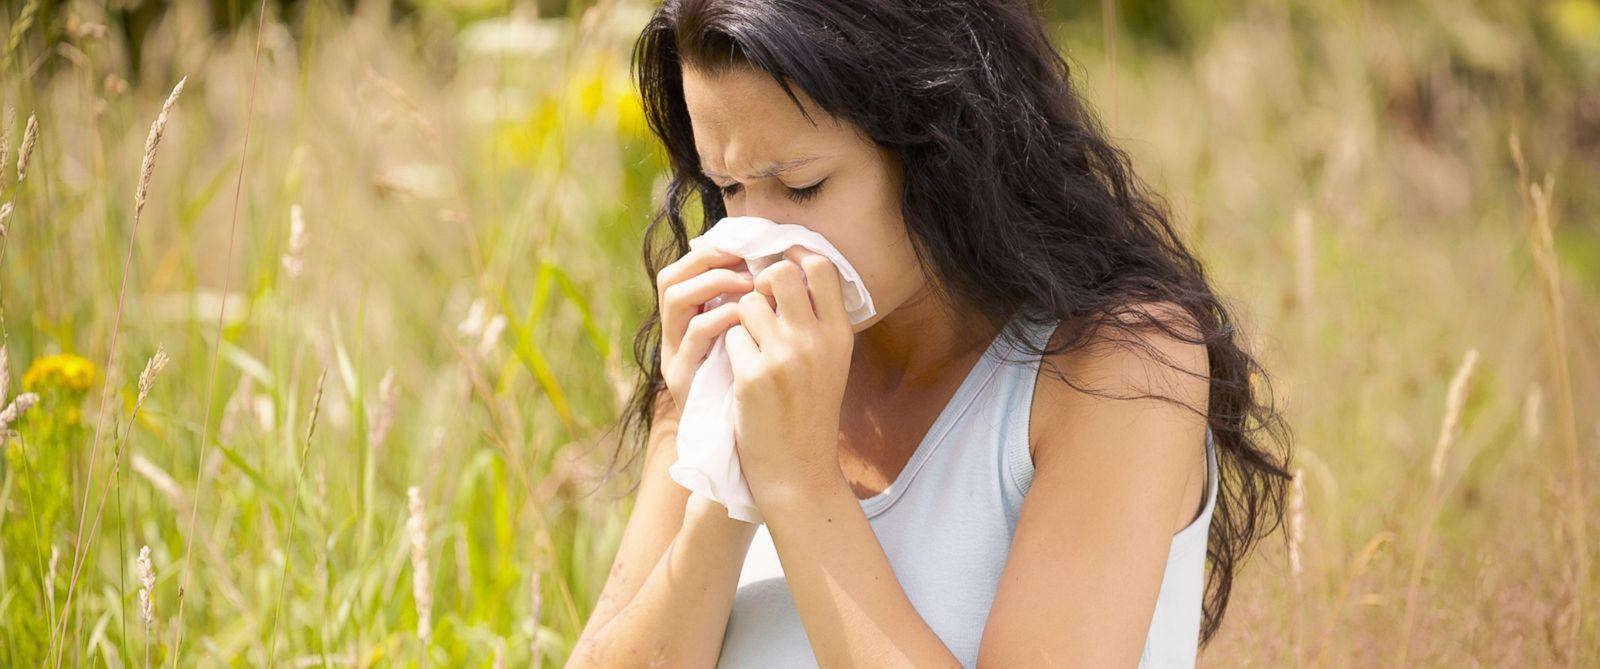 GTY_pollen_allergy_jt_140413_140413_12x5_1600.jpg (1600×669)